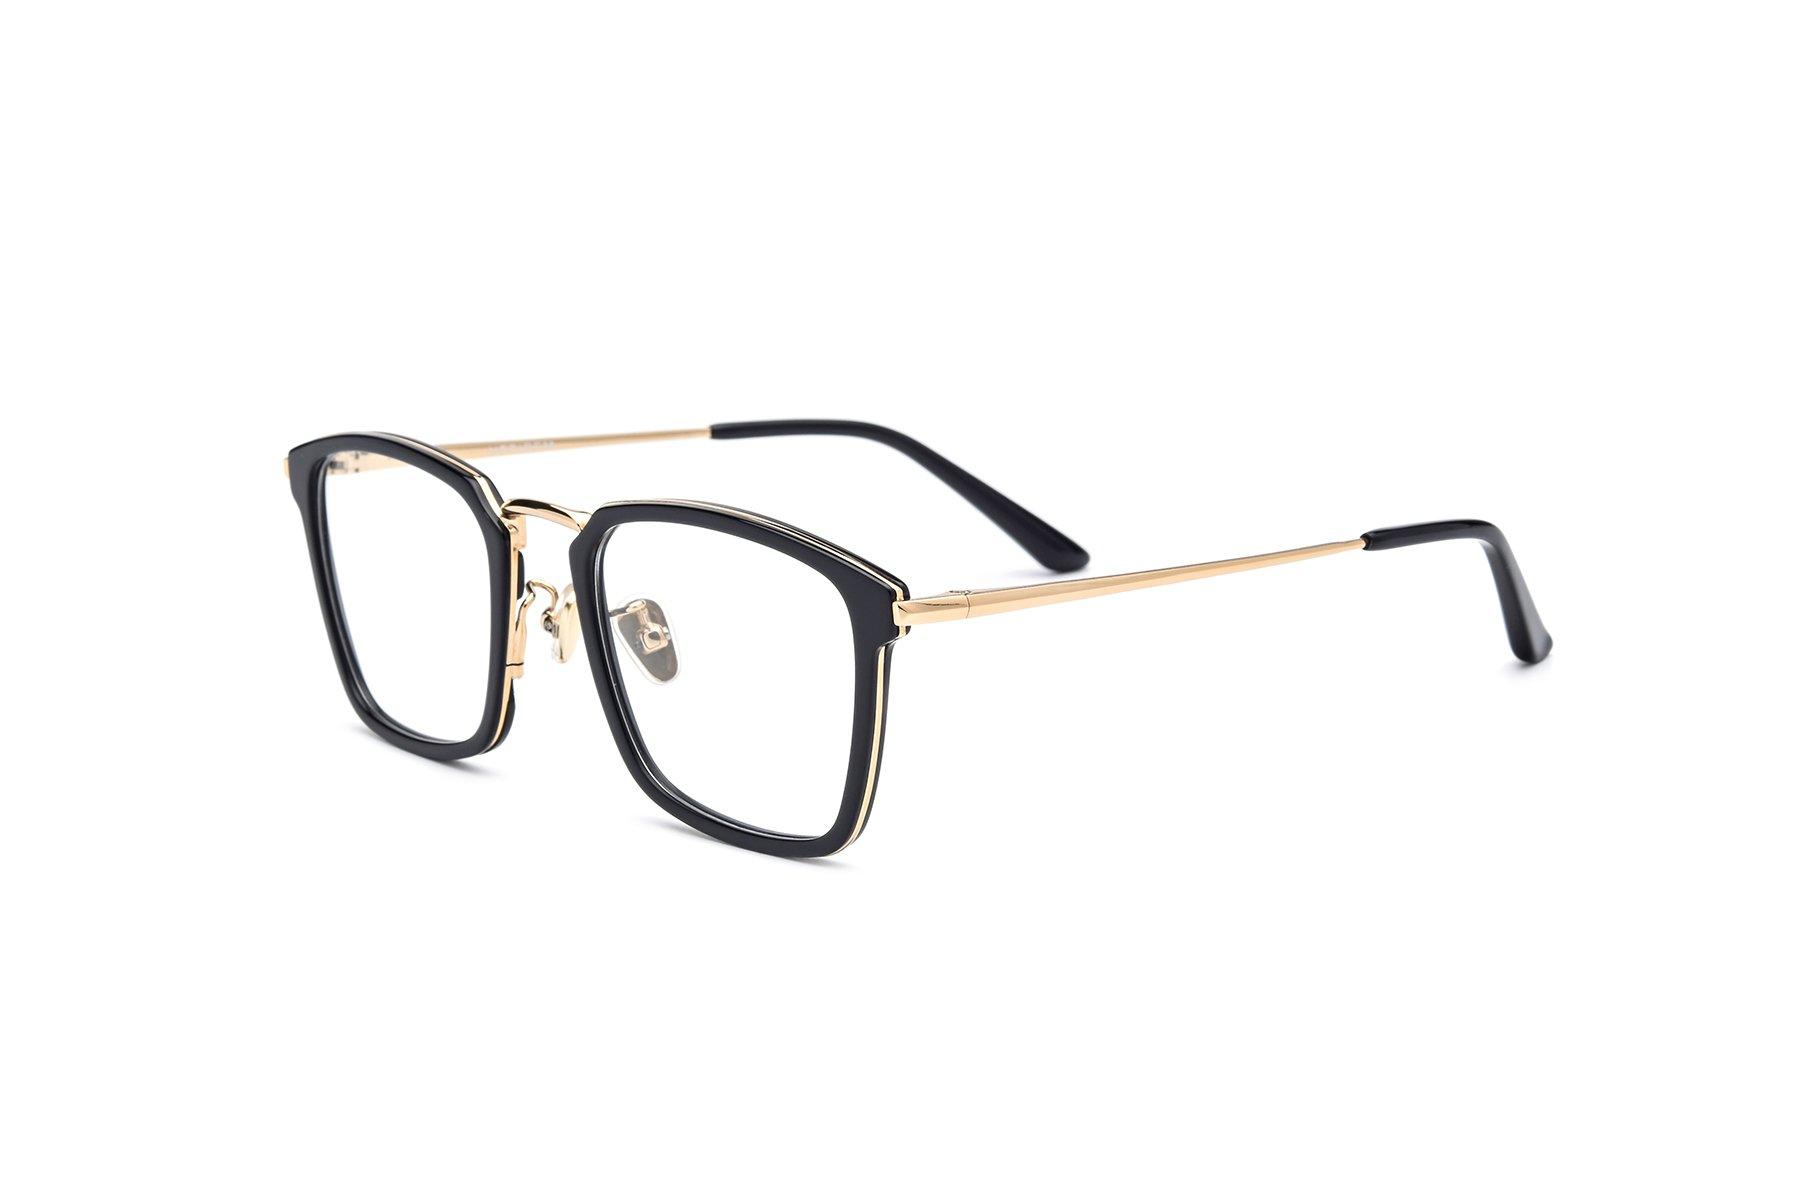 b42837da6987 HEPIDEM Acetate Men Optical Myopia Glasses Frame Prescription Spectacle  70042 (Black Gold)